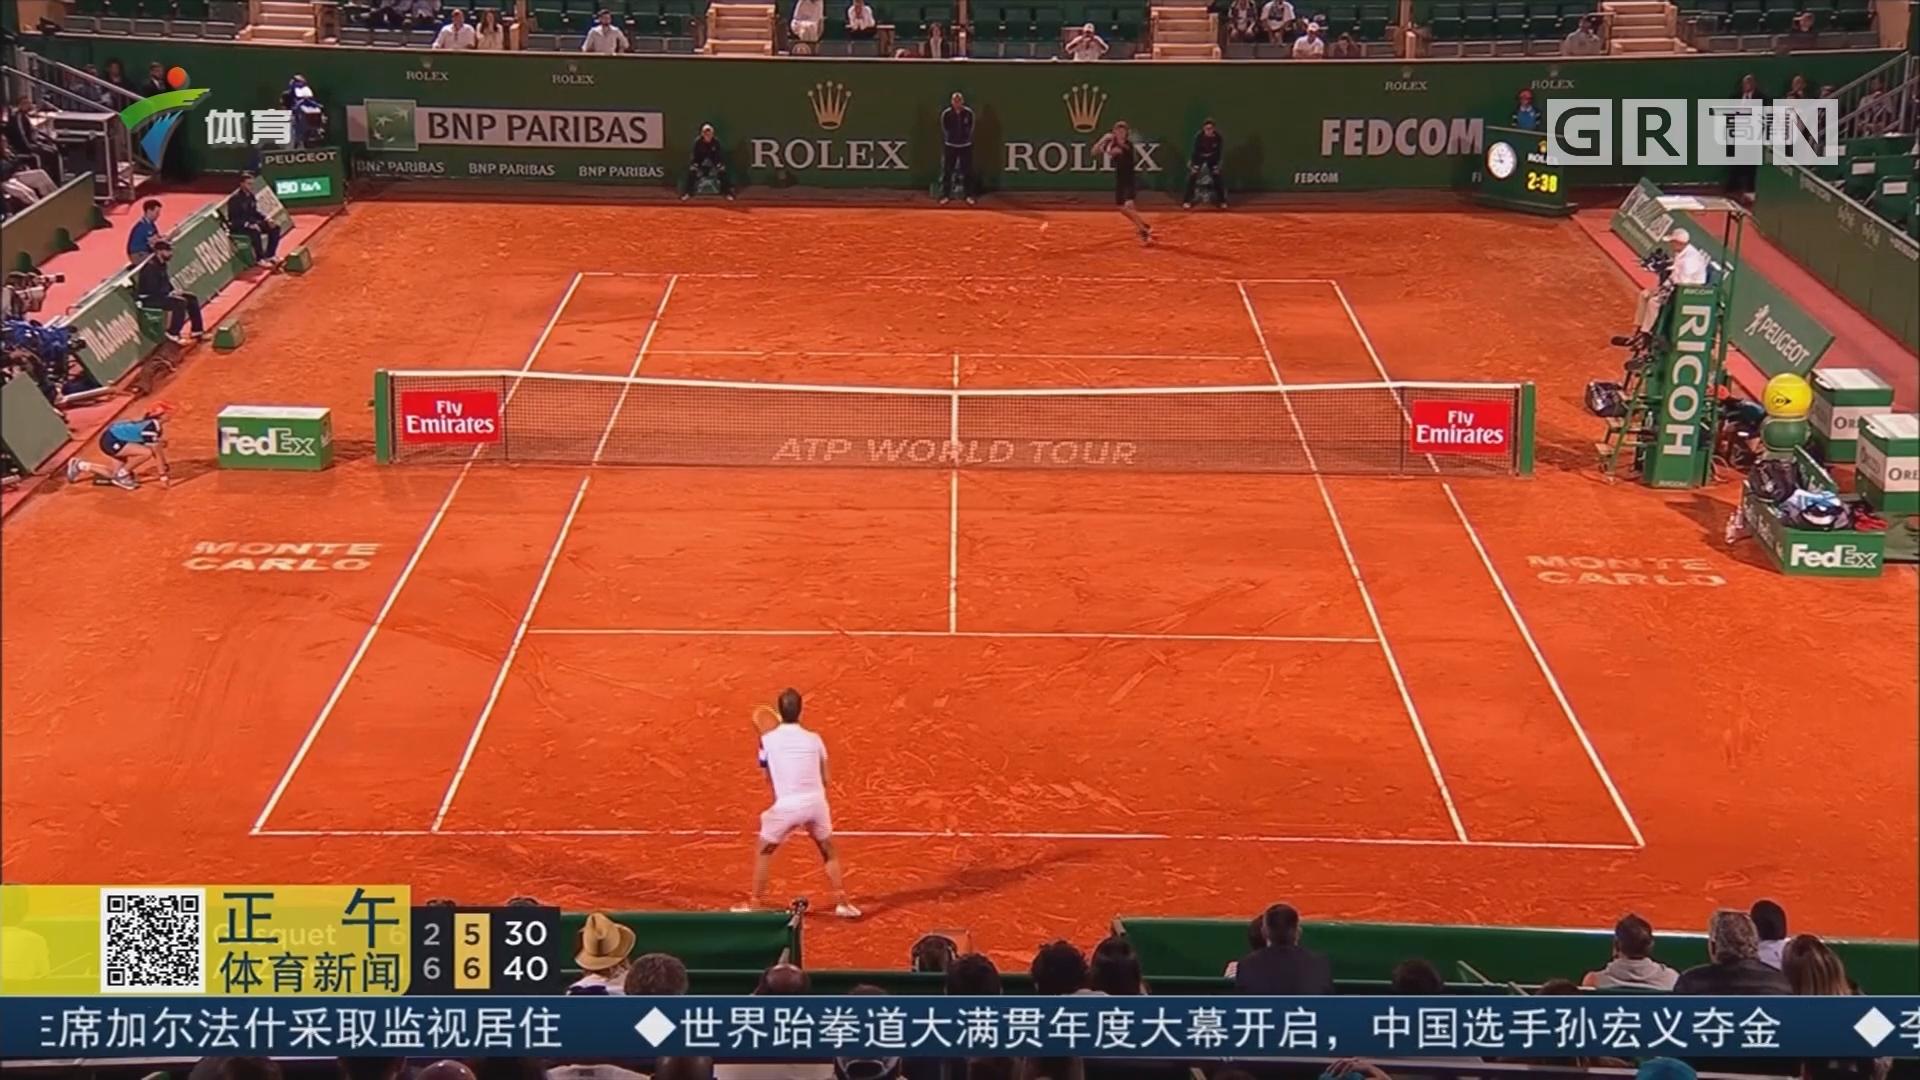 ATP蒙塔卡洛大师赛 锦织圭、兹维列夫进半决赛